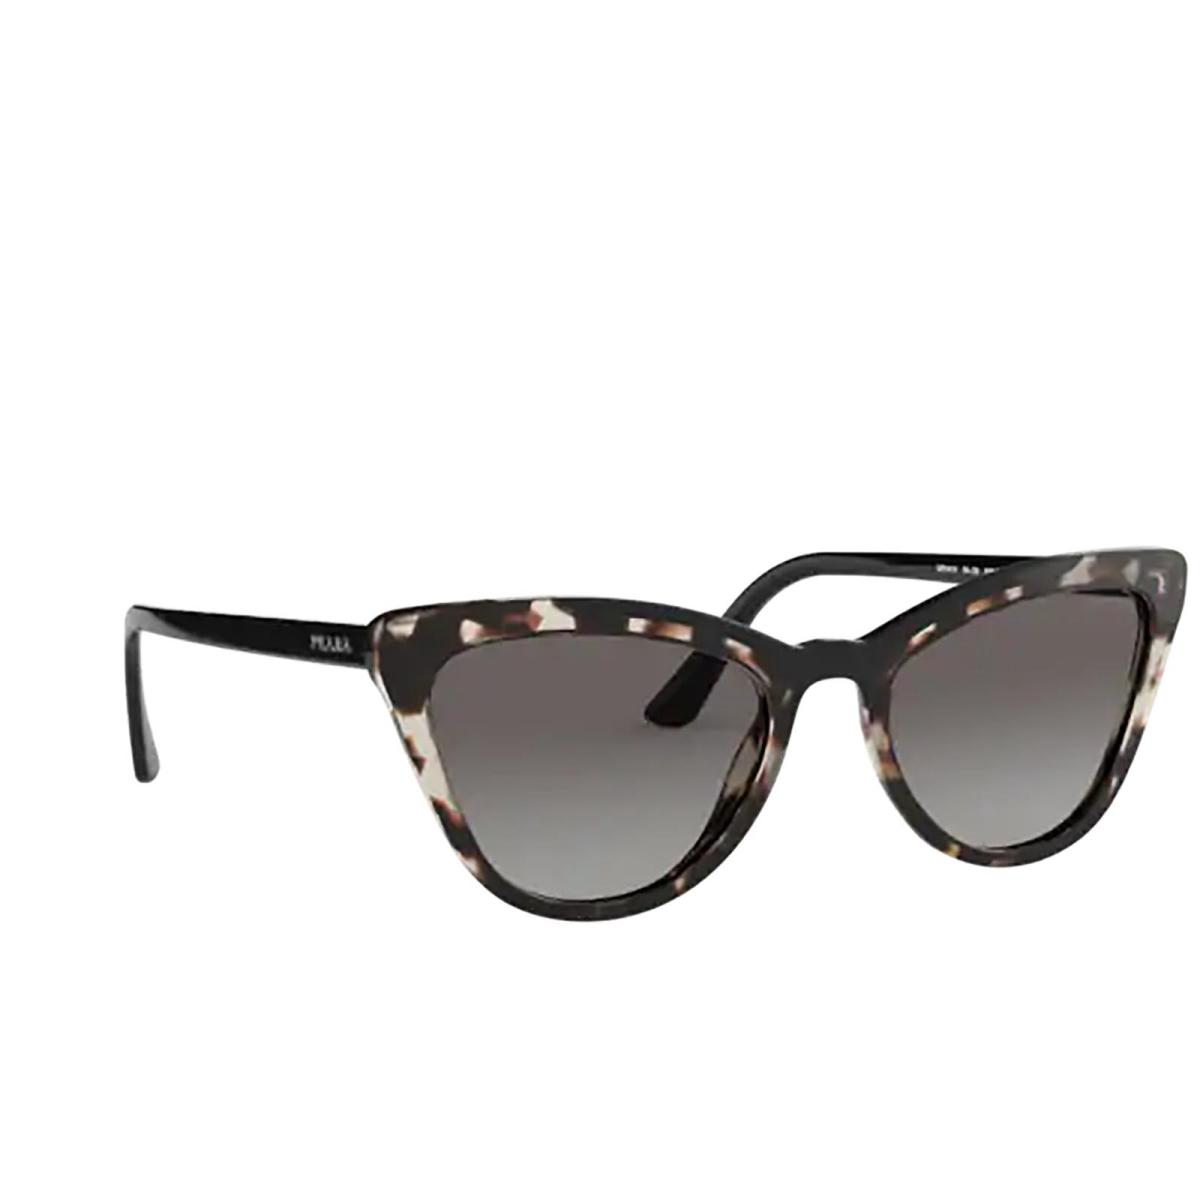 Prada® Cat-eye Sunglasses: PR 01VS color Opal Spotted Brown / Black 3980A7.